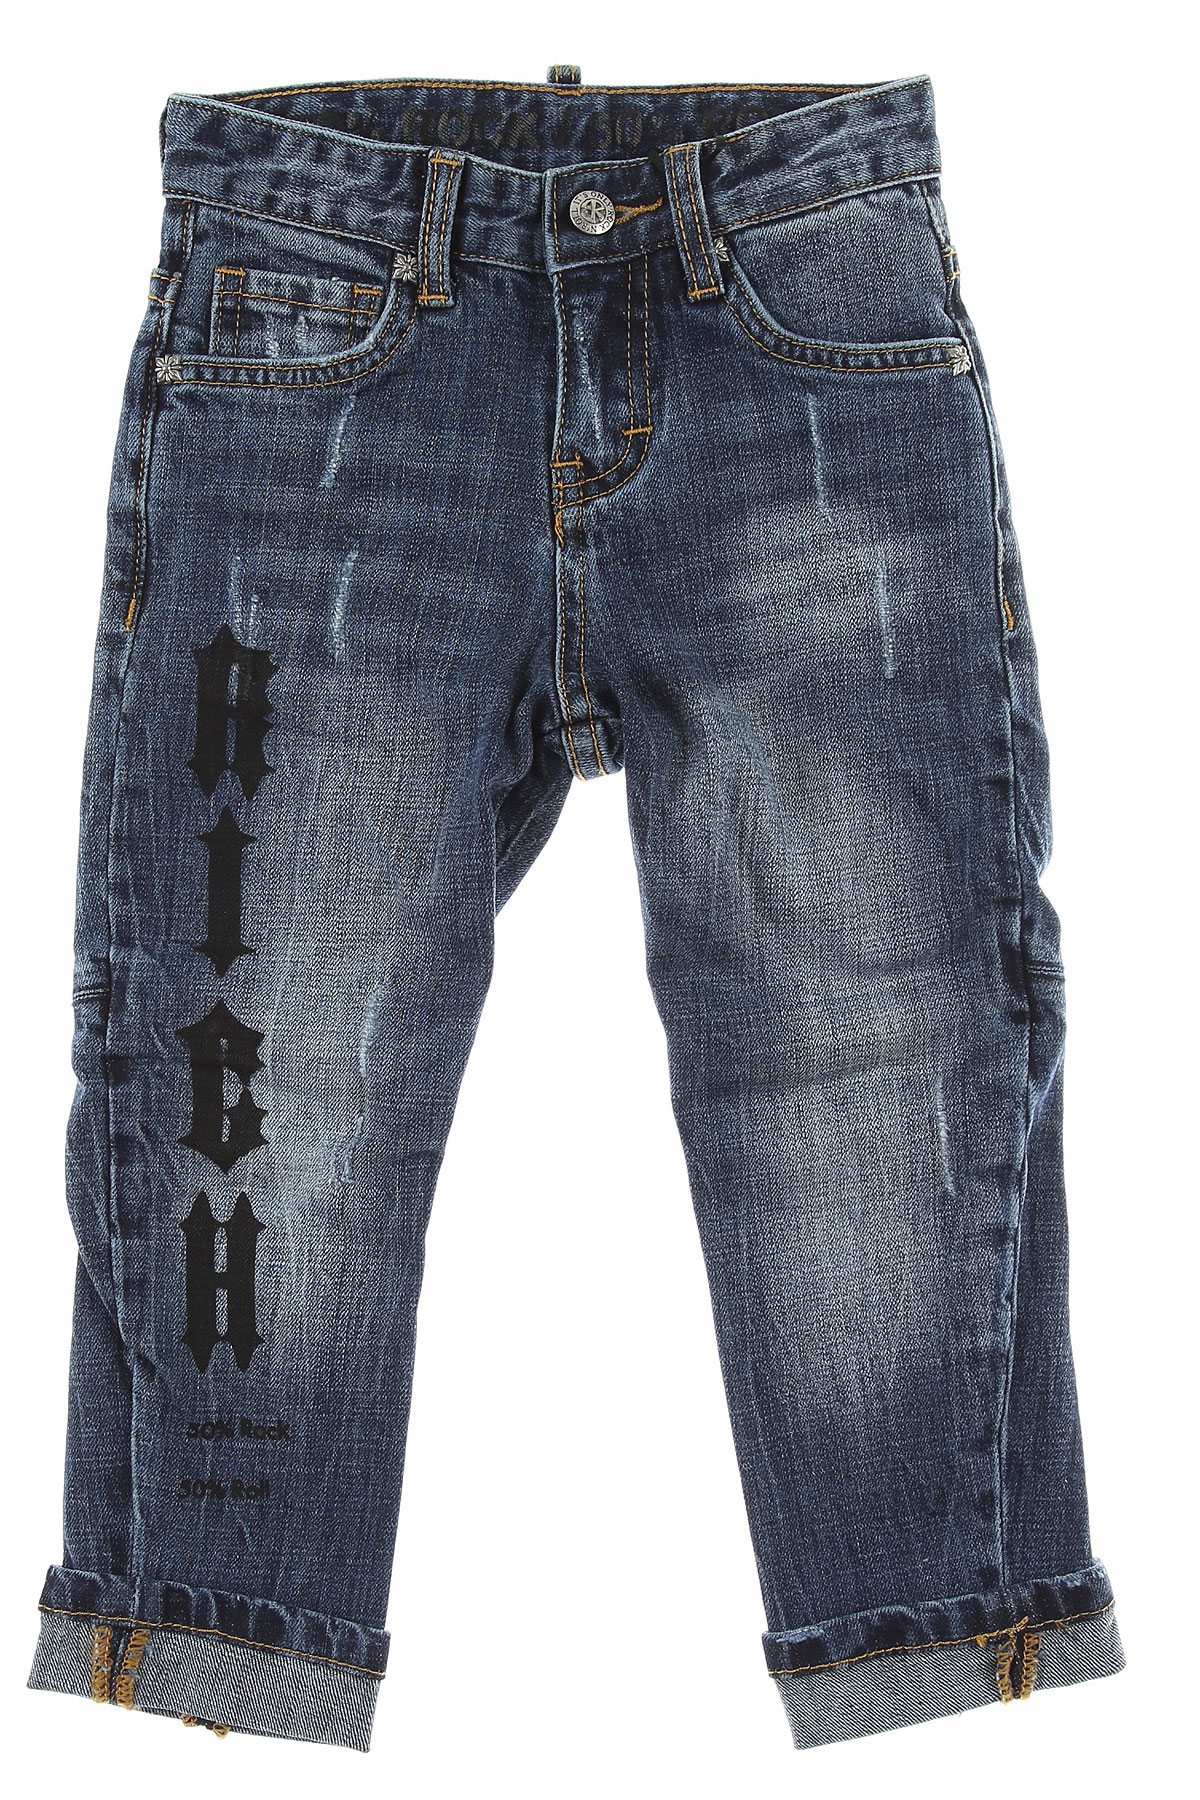 Image of John Richmond Kids Jeans for Girls, Blue Denim, Cotton, 2017, 10Y 14Y 16Y 2Y 4Y 6Y 8Y